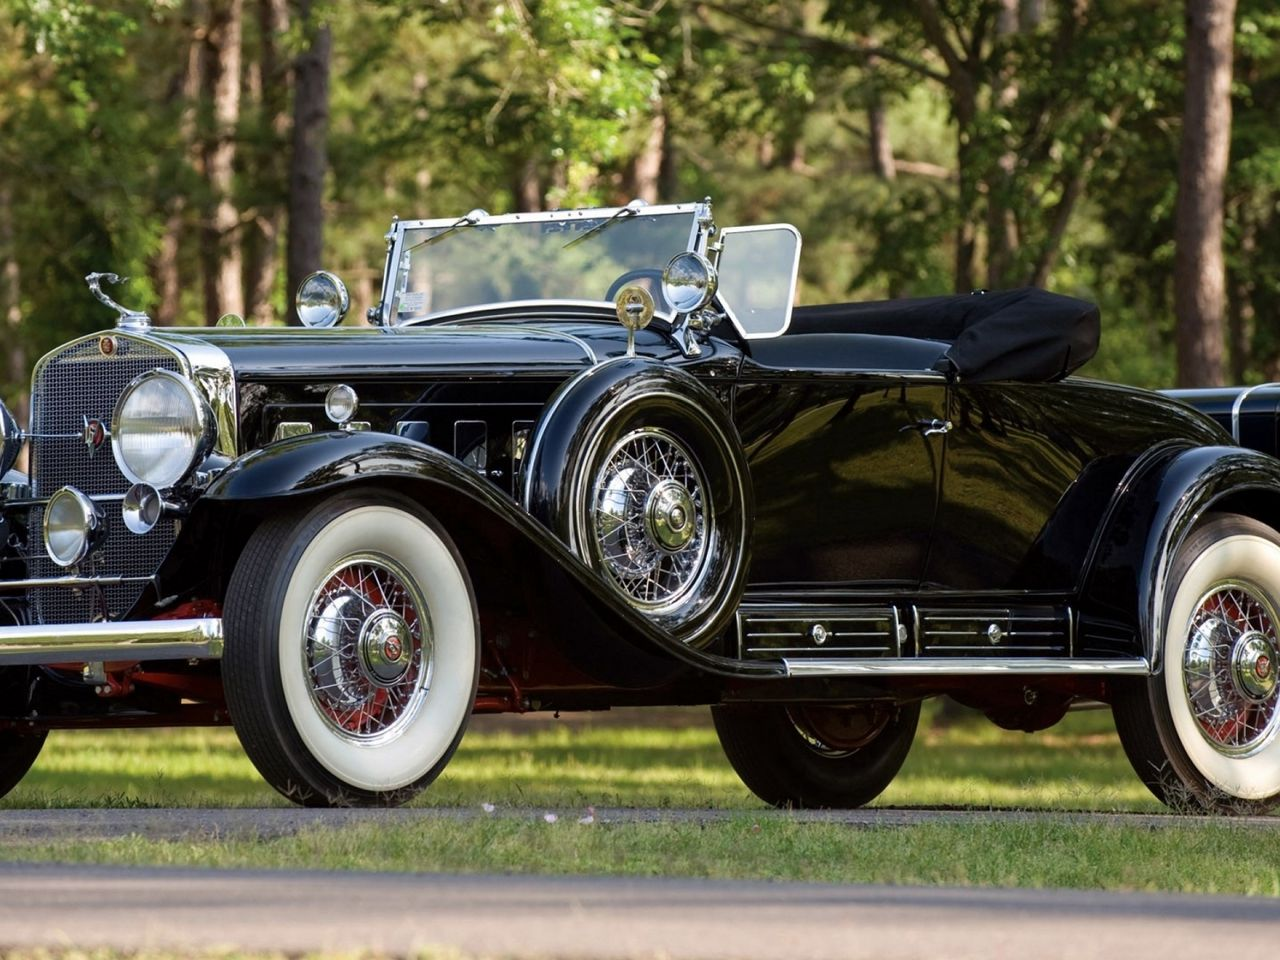 Wallpaper Cadillac, Vintage Car, American Car - Vintage Car , HD Wallpaper & Backgrounds